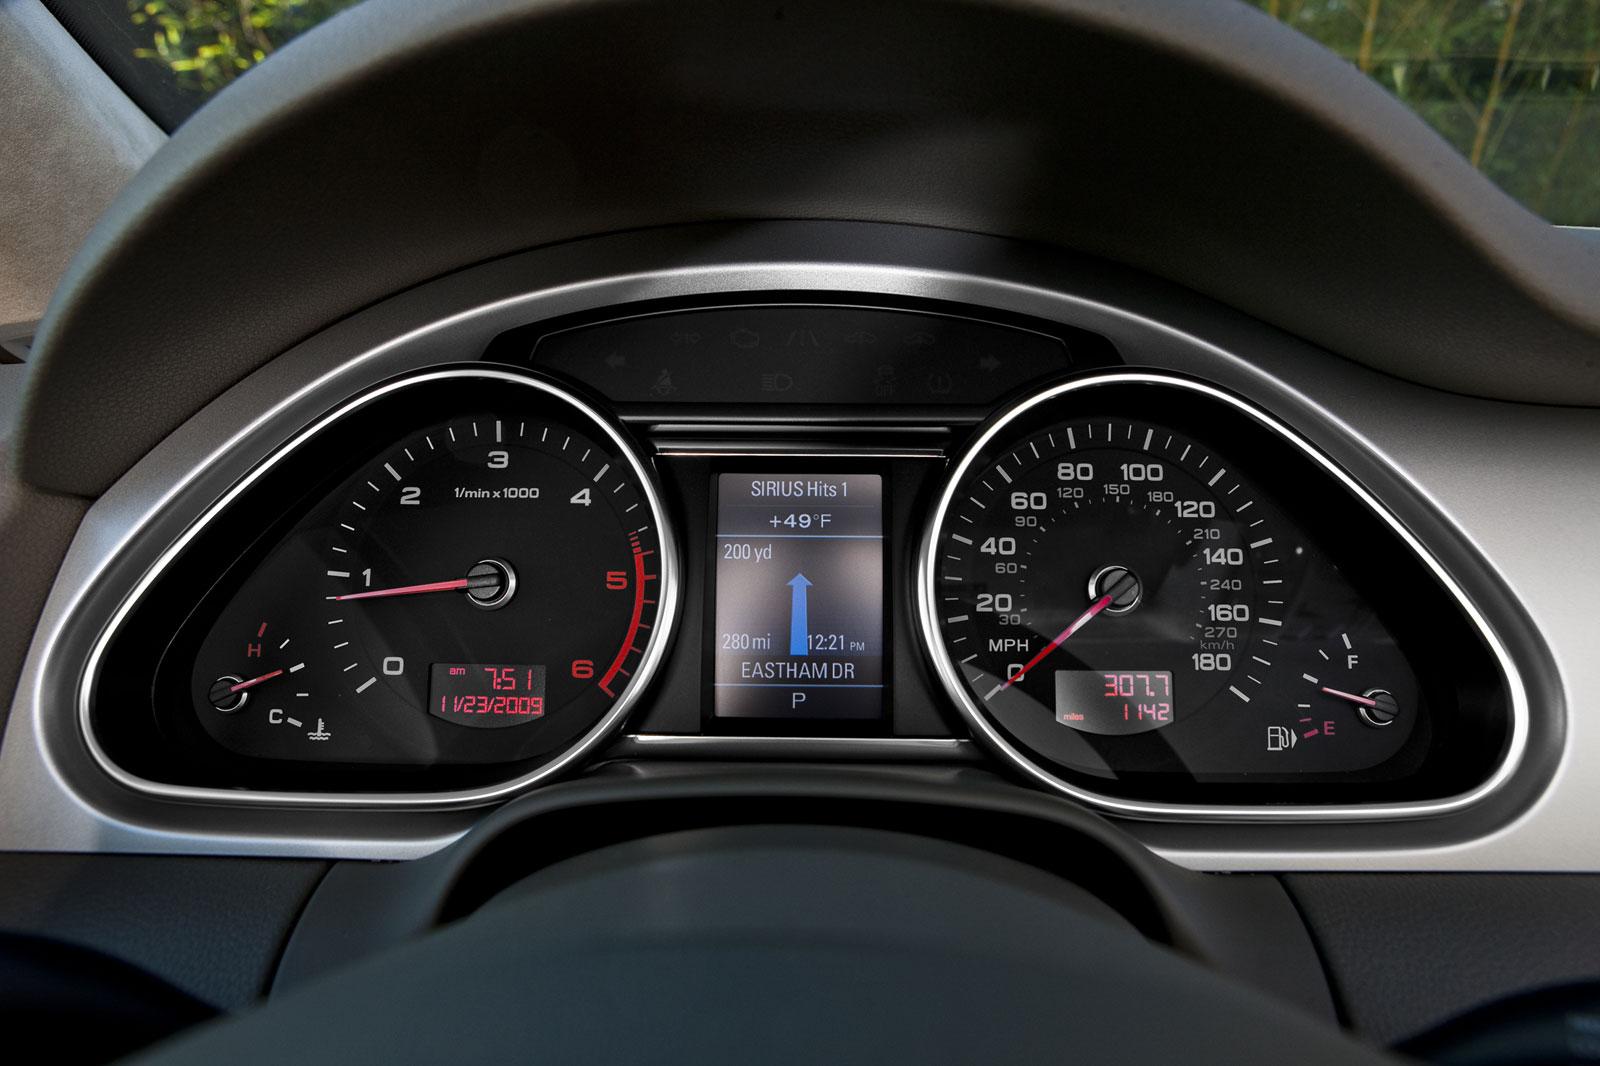 AUDI Q7 3.0 silver